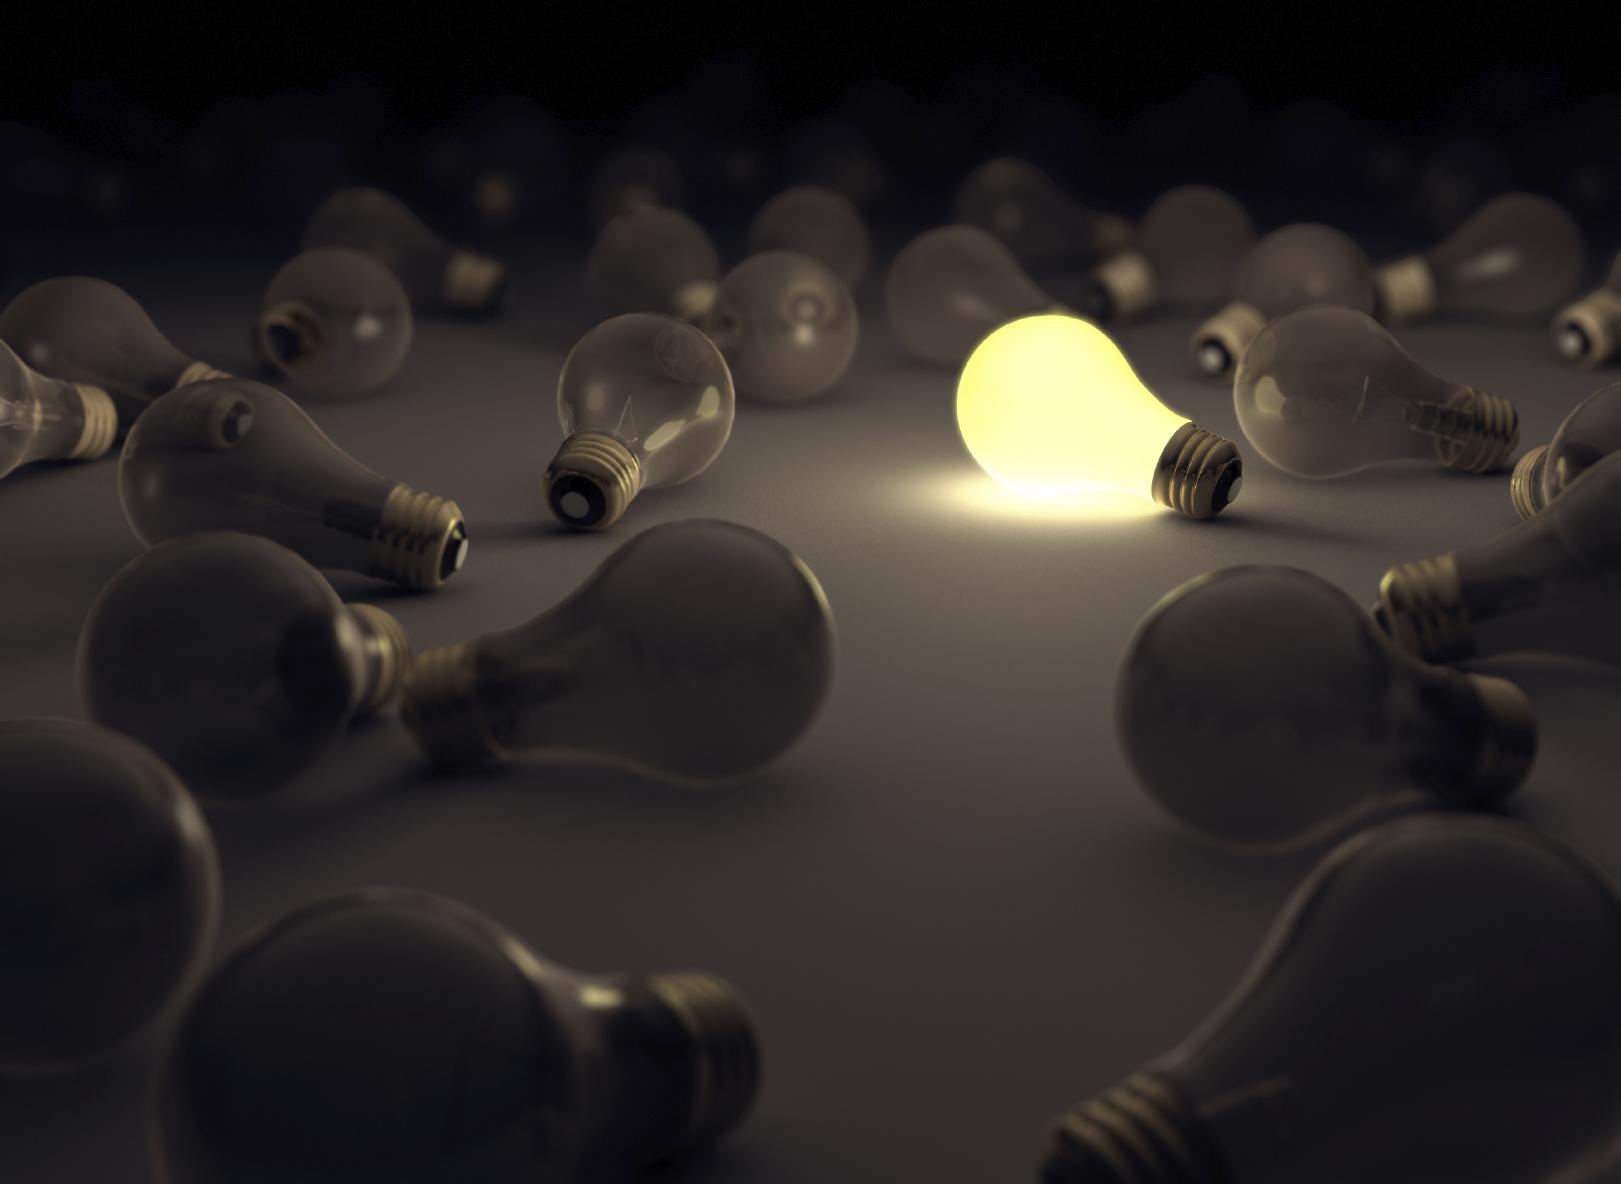 1-bright-bulb-among-many